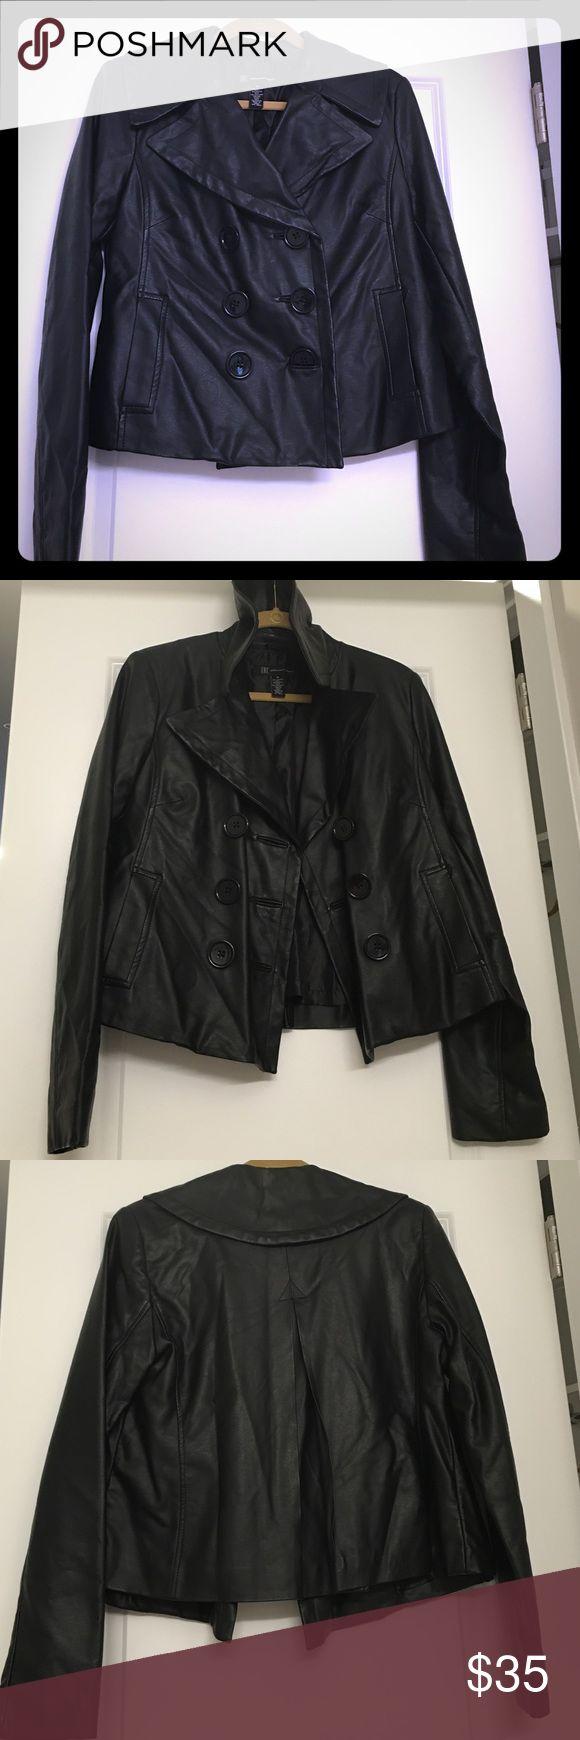 Macy's INC Black Jacket Macy's INC Black Non-Leather Jacket. Shell: 100% Rayon with Polyurethane Coating; Lining: 100% Polyester INC International Concepts Jackets & Coats